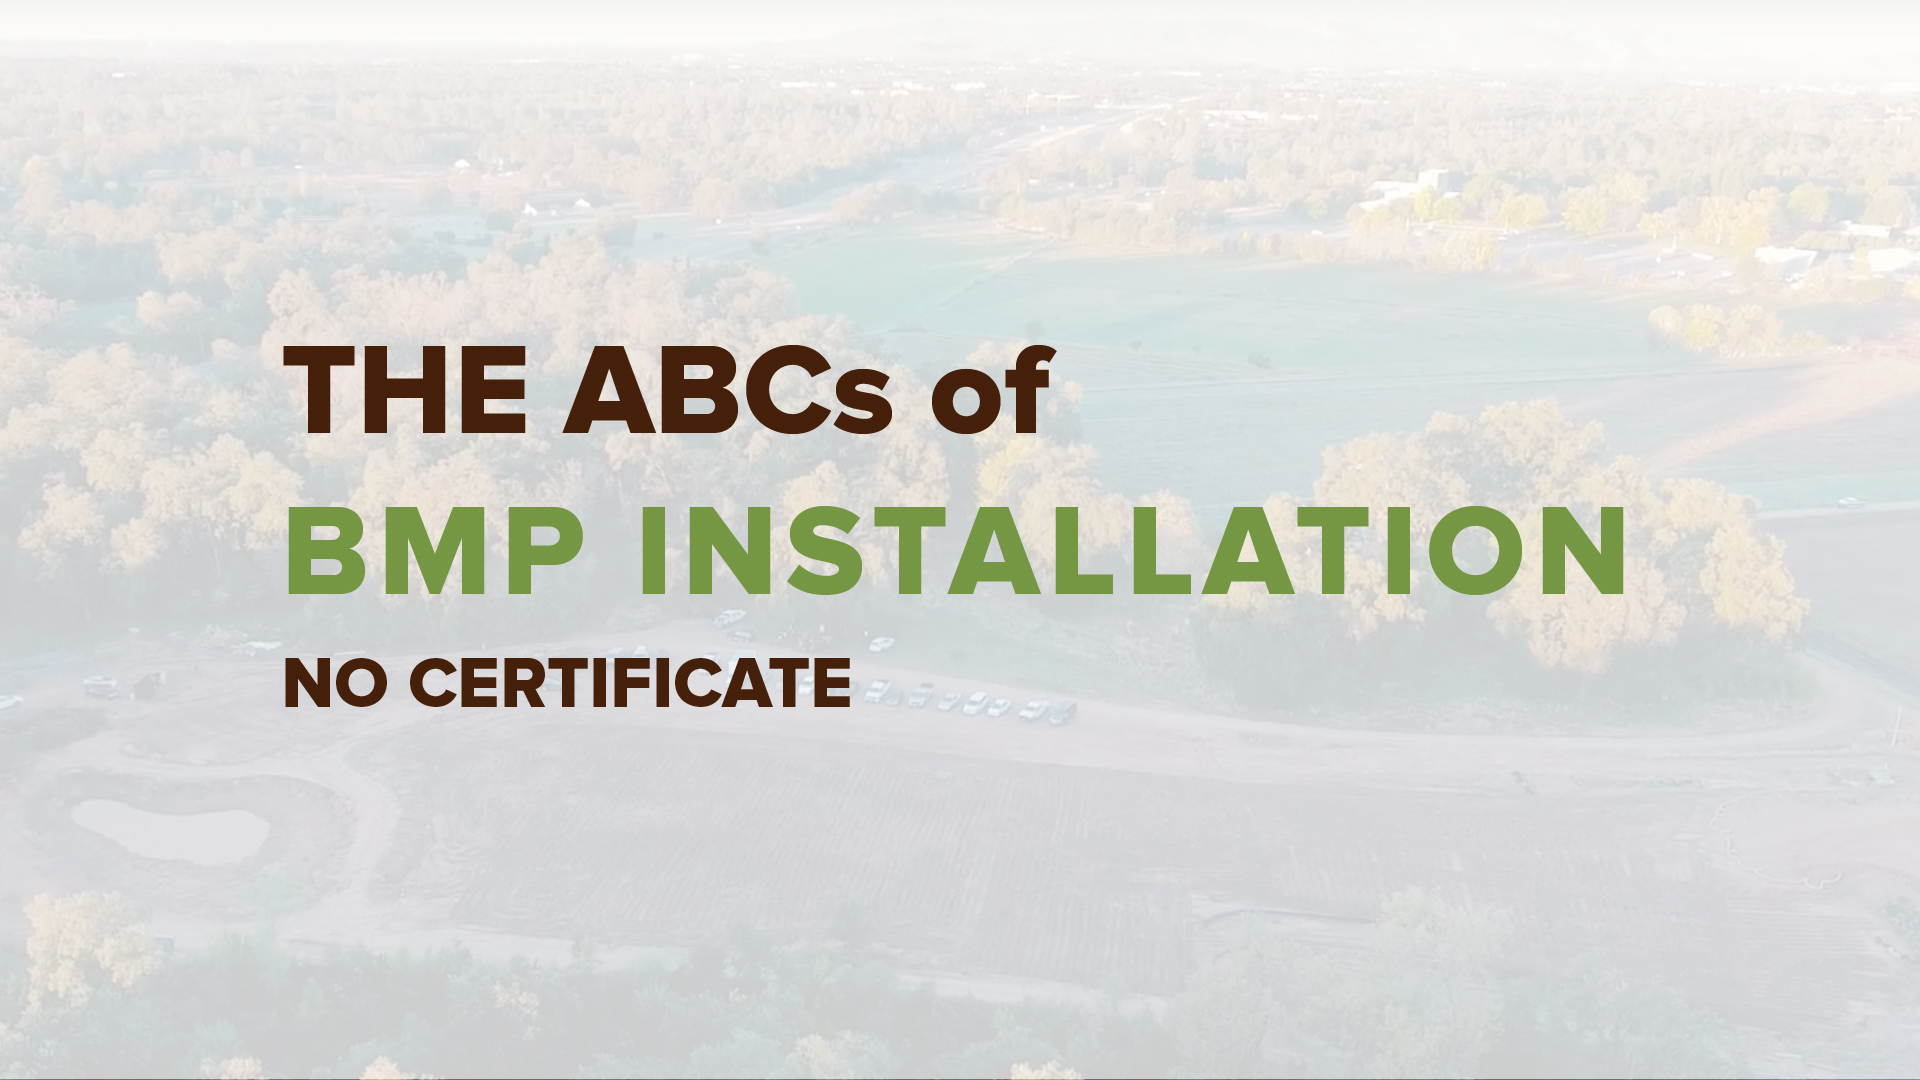 ABC's BMP Installation No Cert. 01